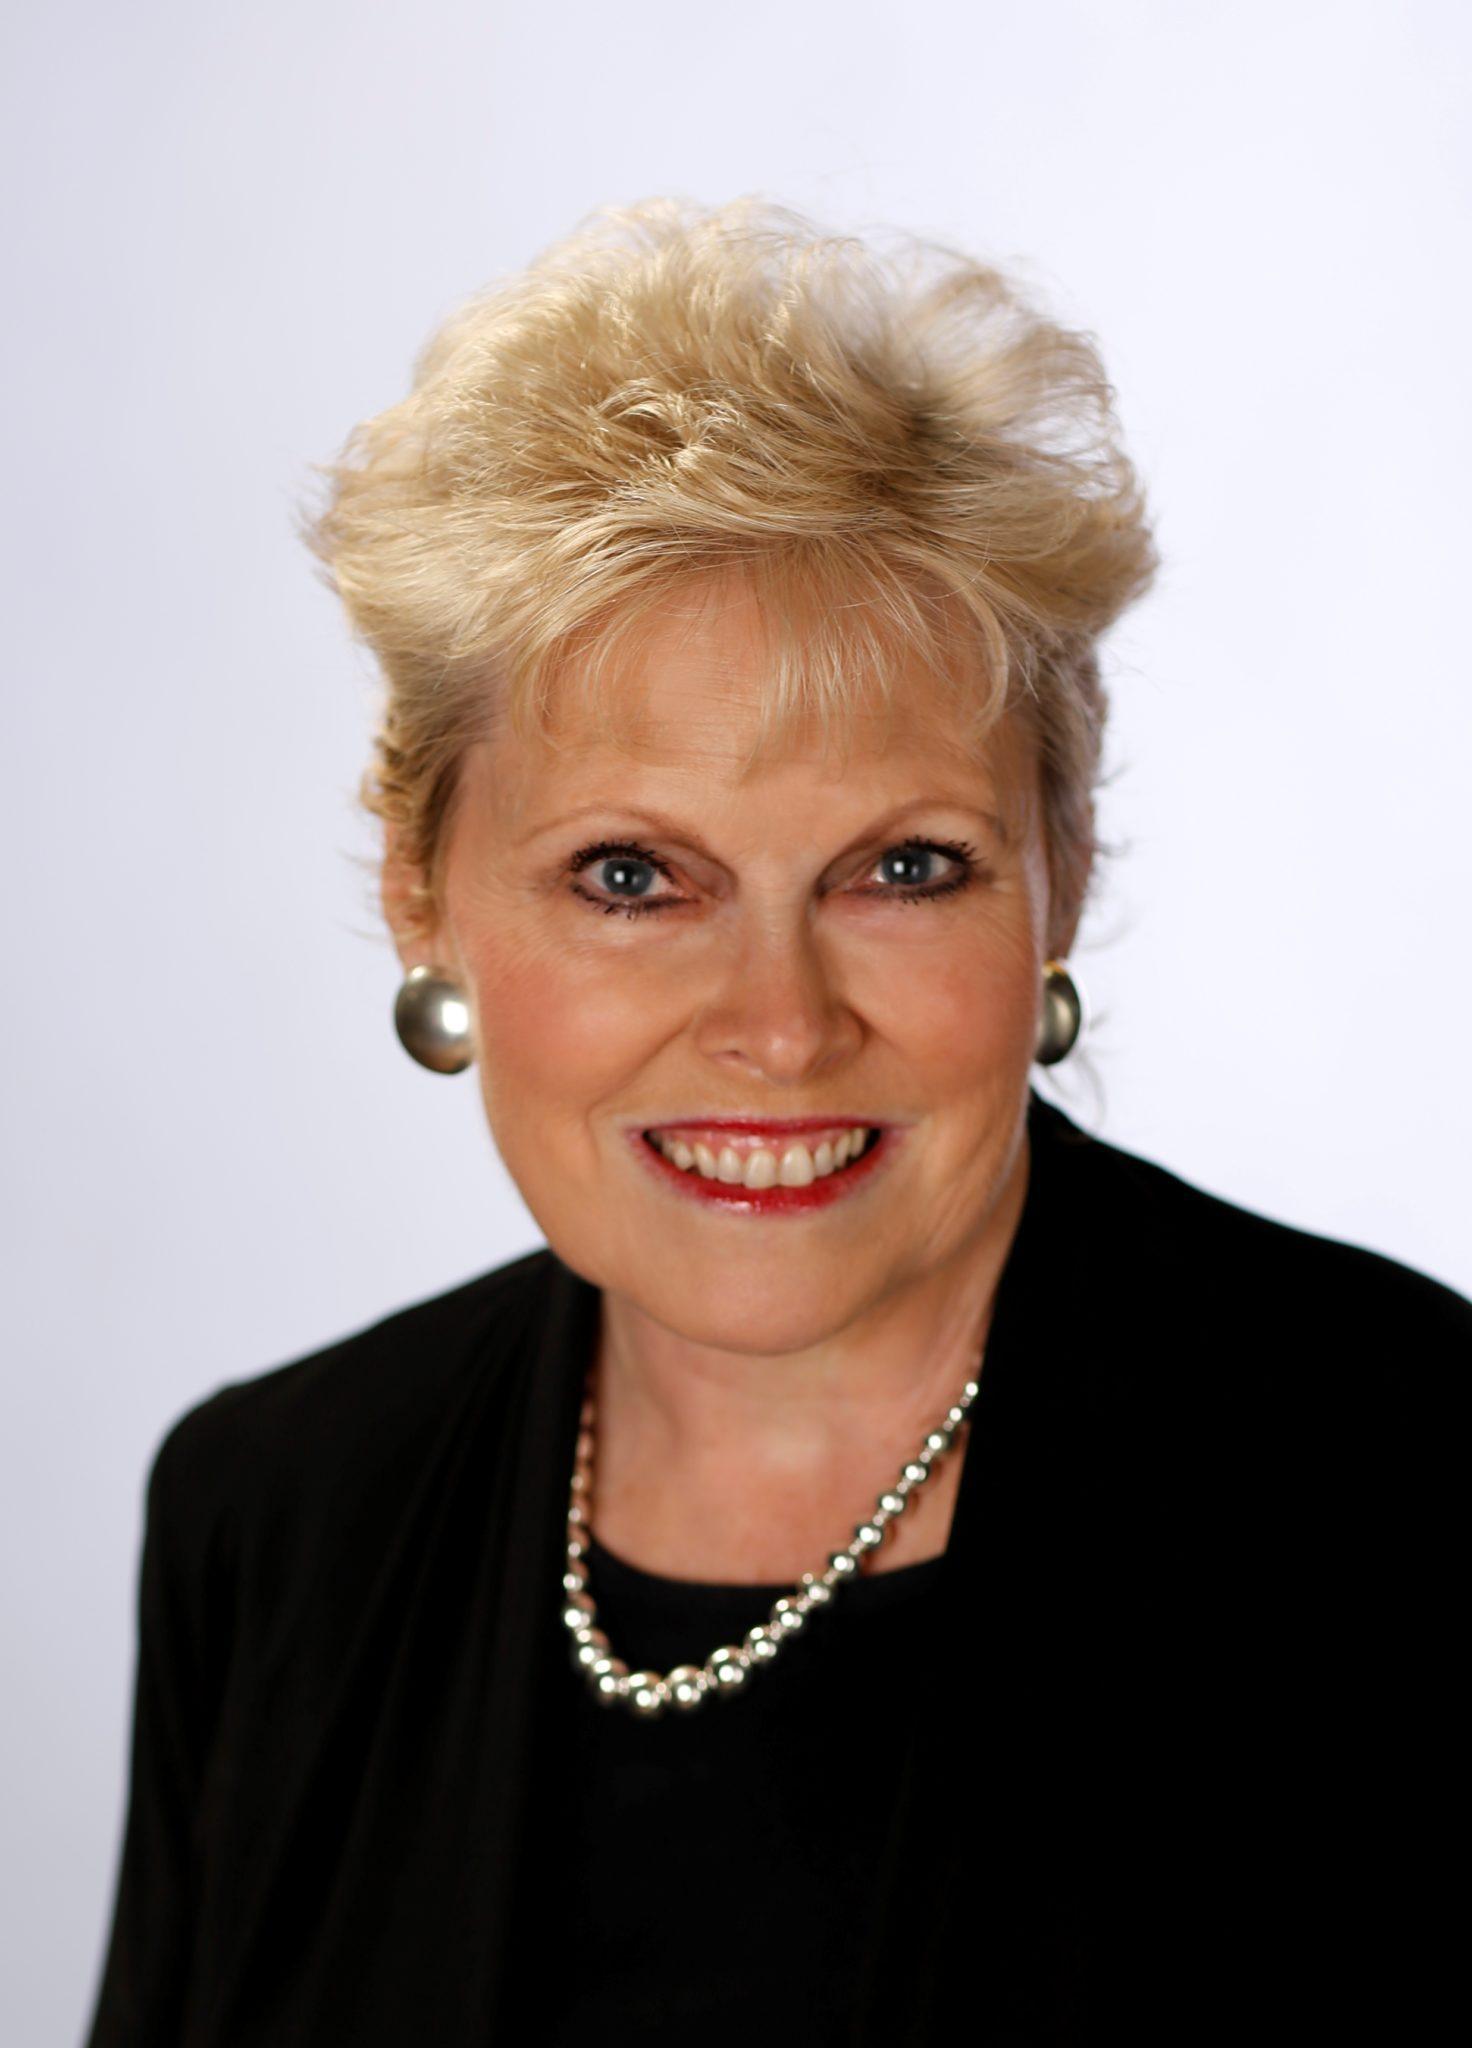 Pam O'Connor, President of LeadingRE